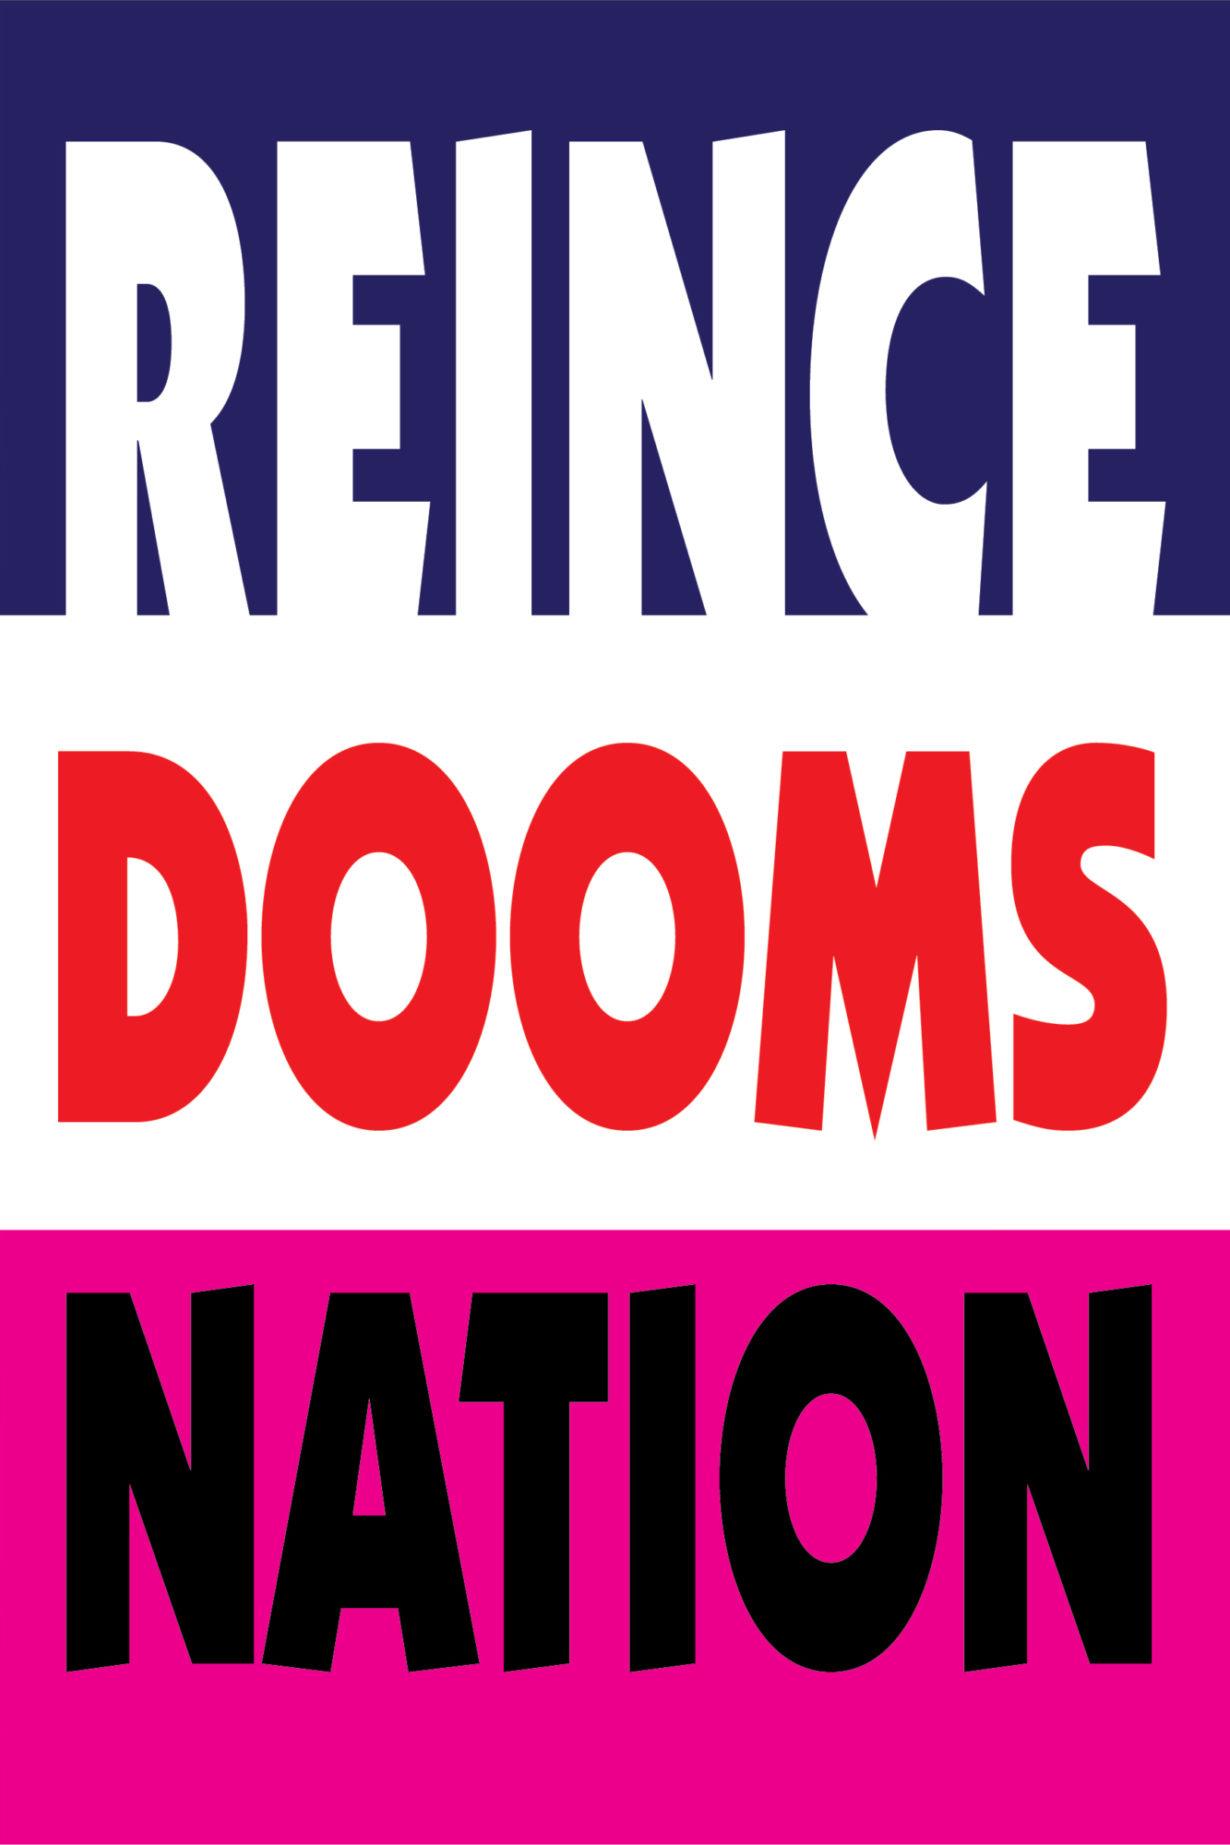 NP_76_100_2017_Reince-Dooms-Nation.jpg